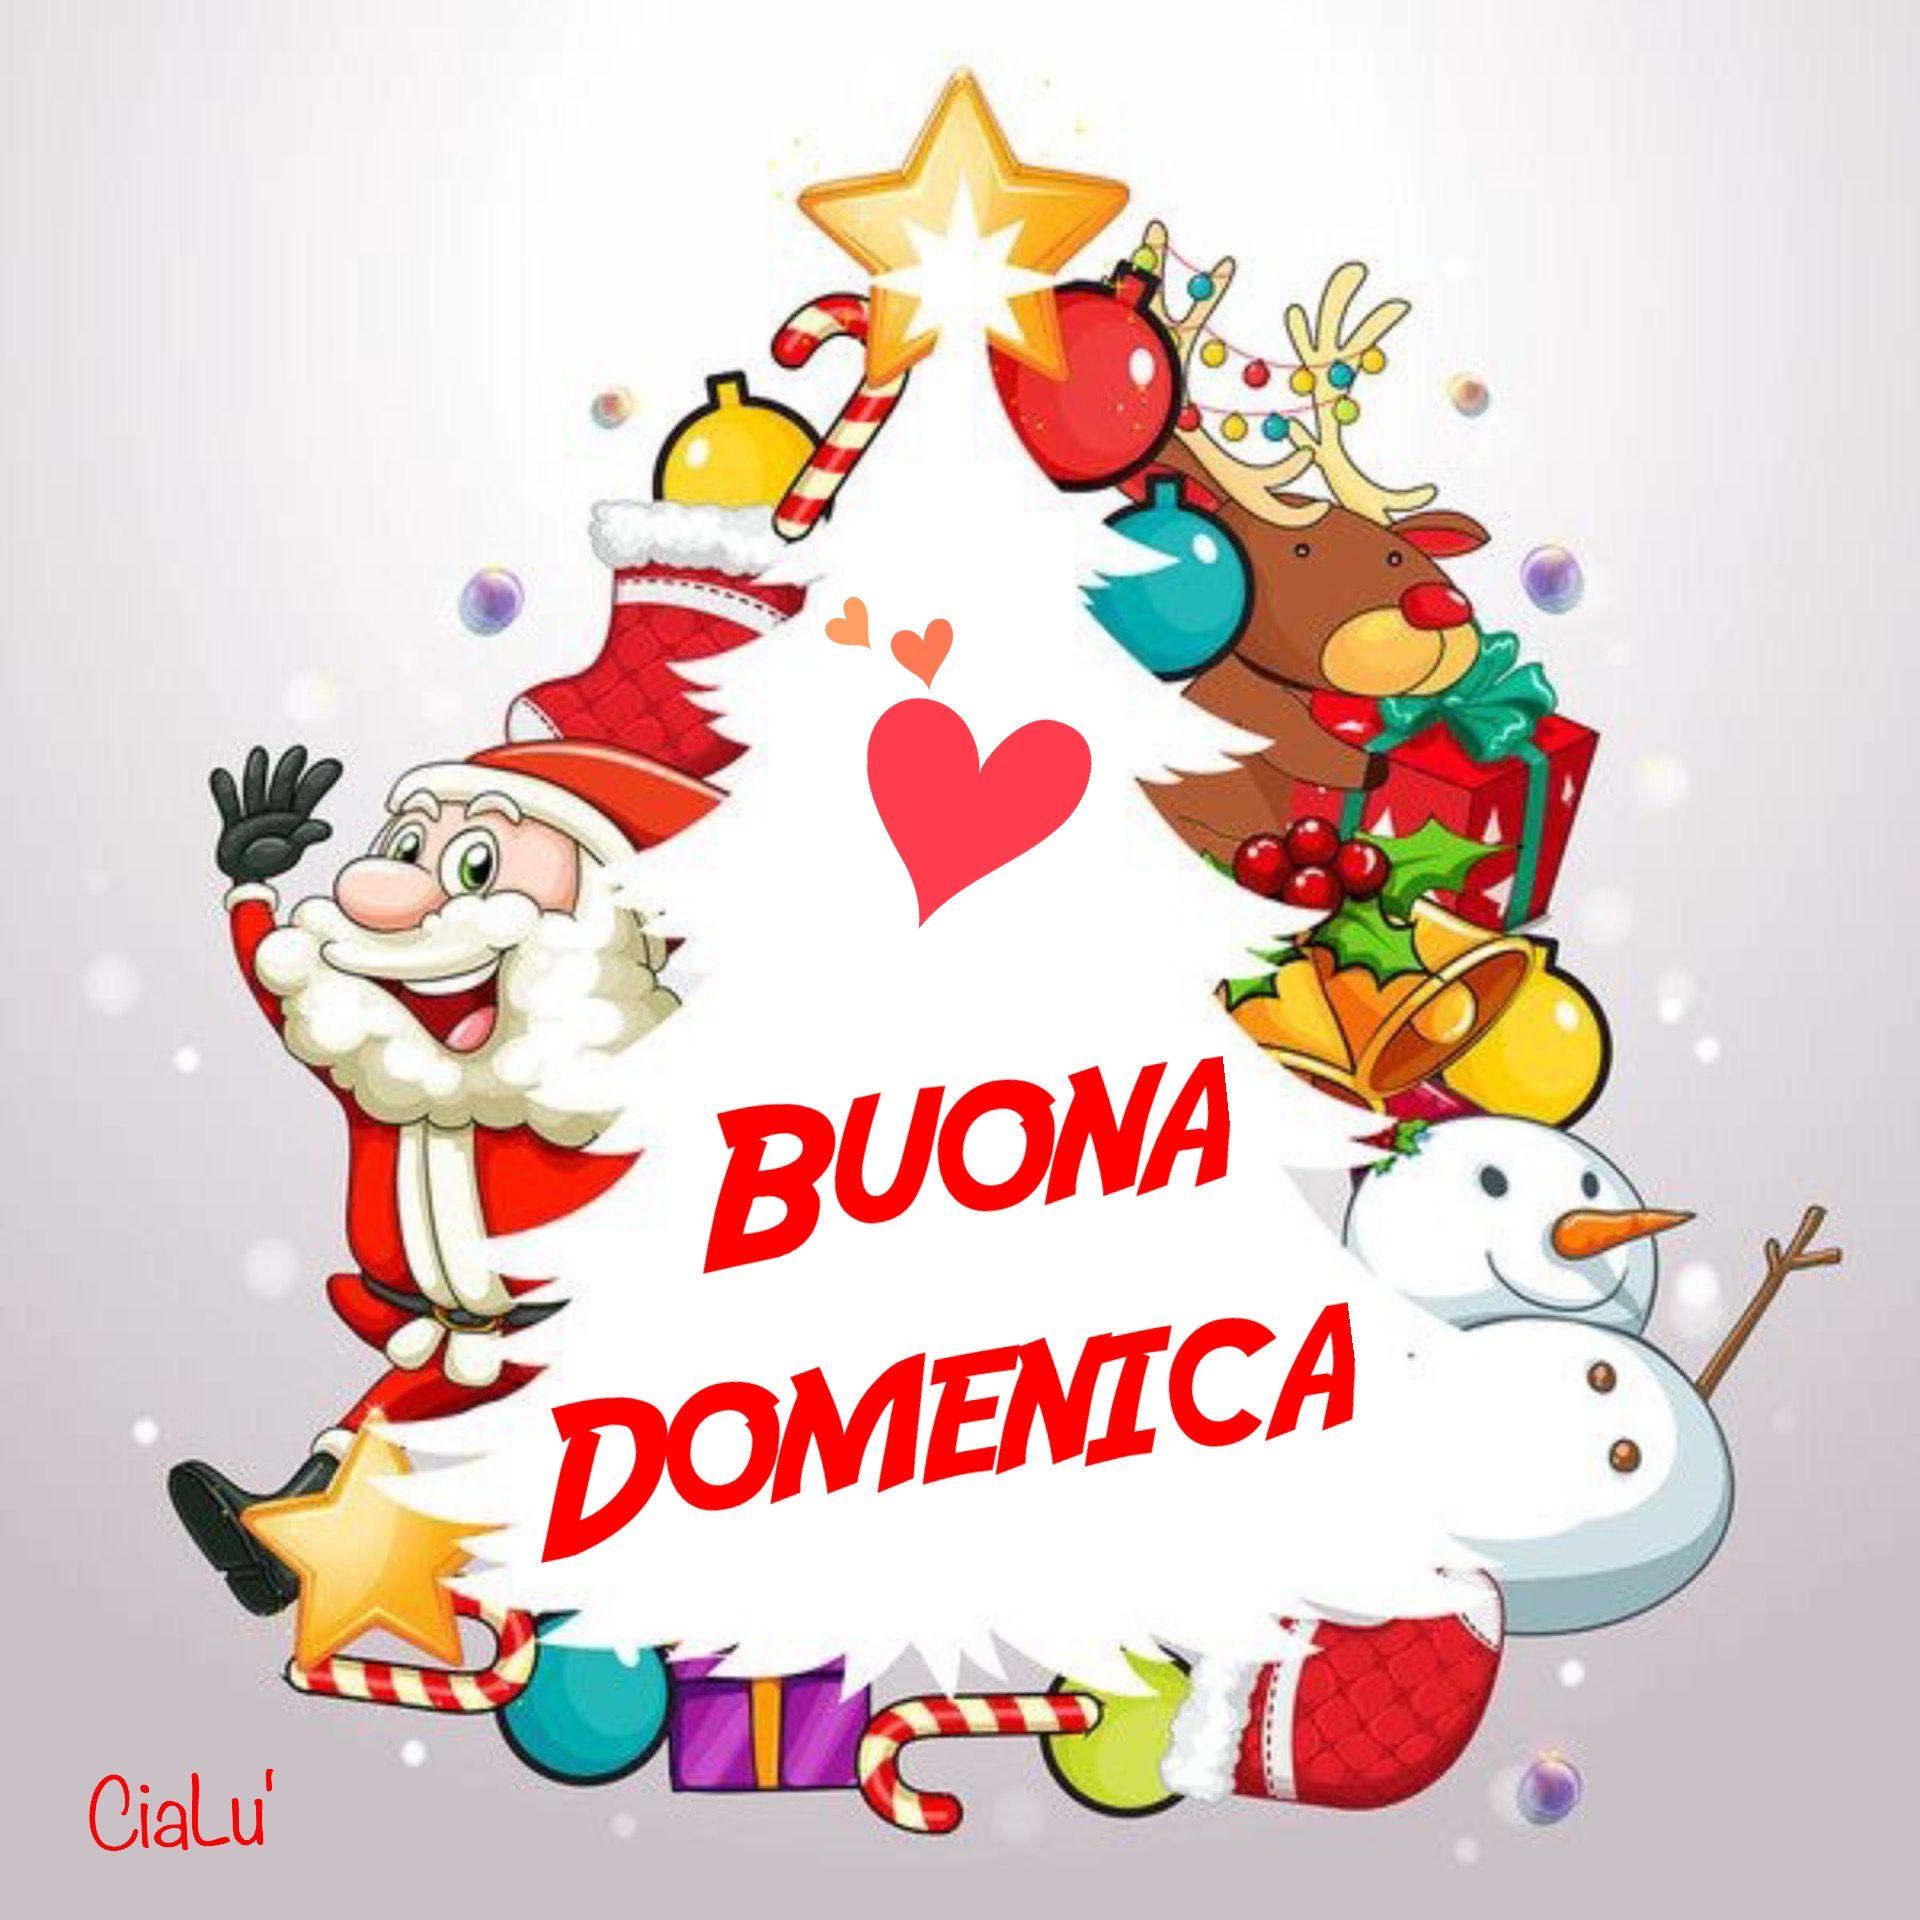 Buona Domenica Buon Giorno Italia Pinterest Italian Greetings